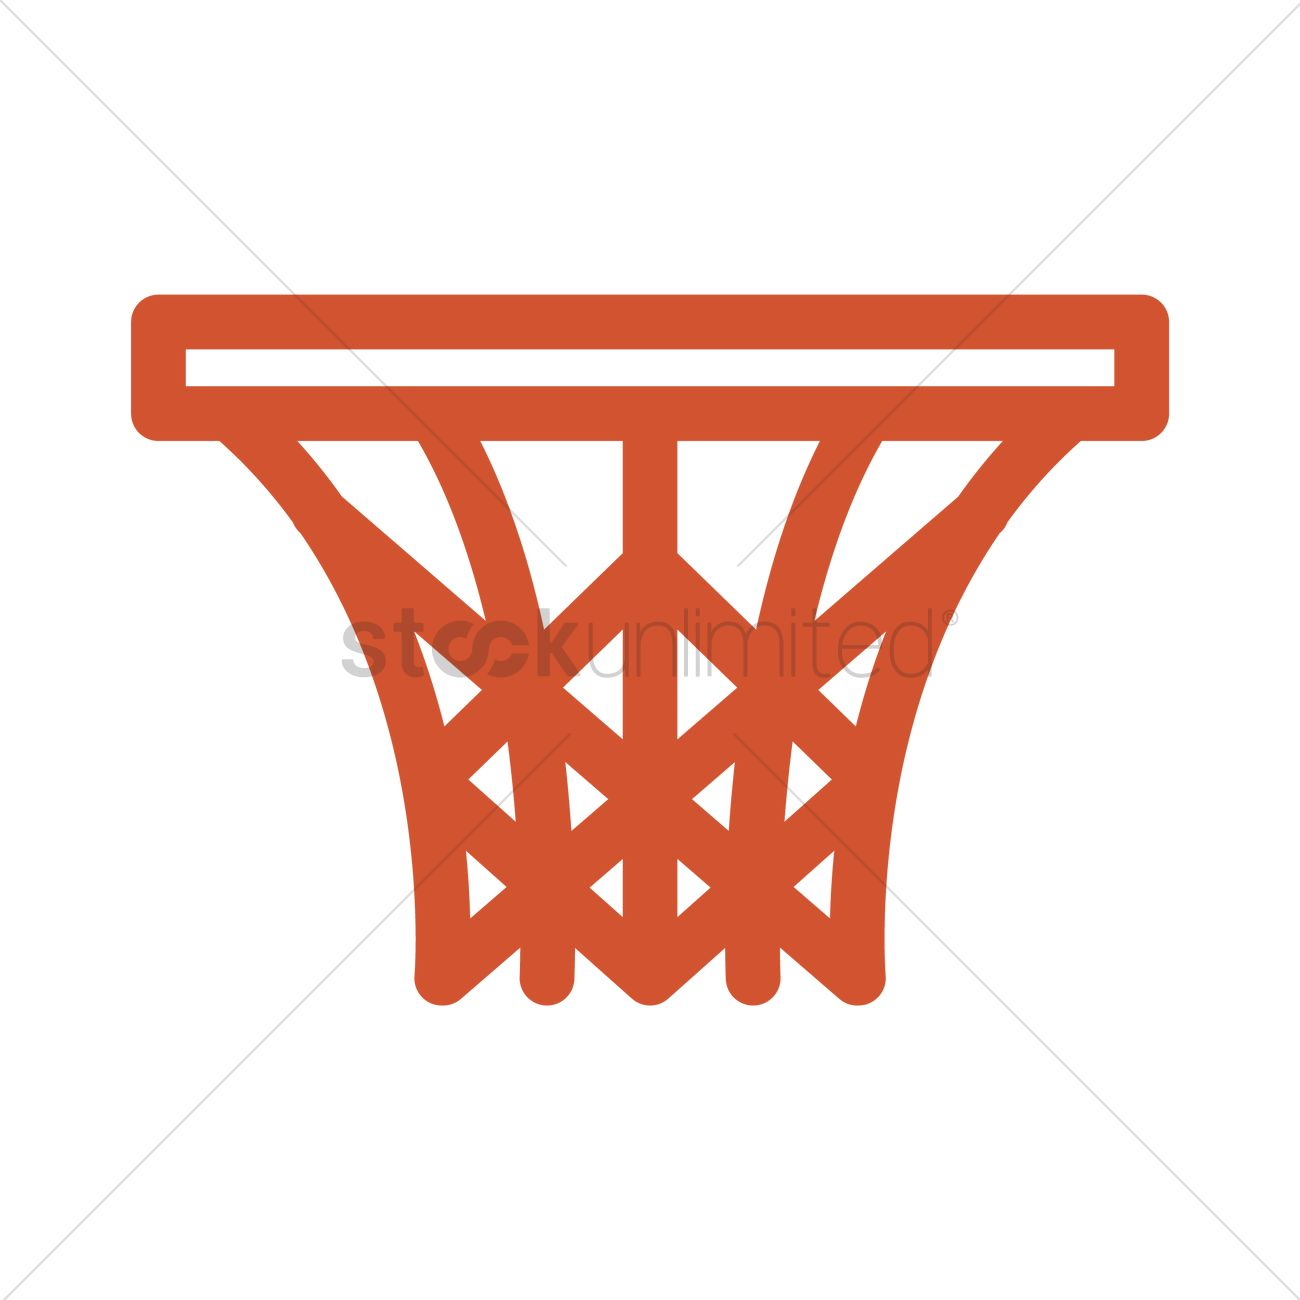 Basketball Hoop Vector Image 1992843 Stockunlimited